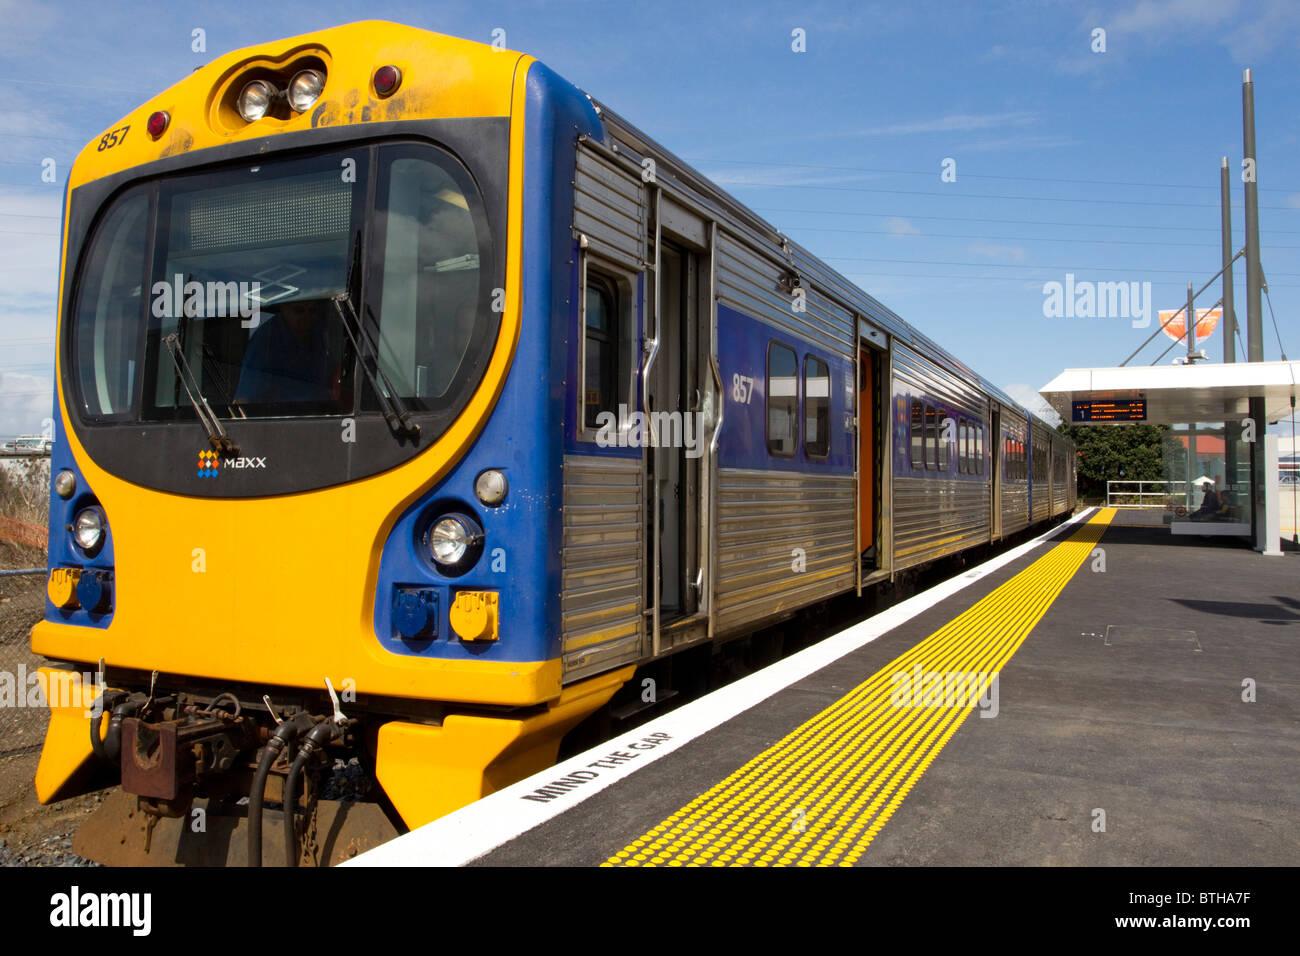 Train at platform, Onehunga Railway Station, Auckland, New Zealand - Stock Image